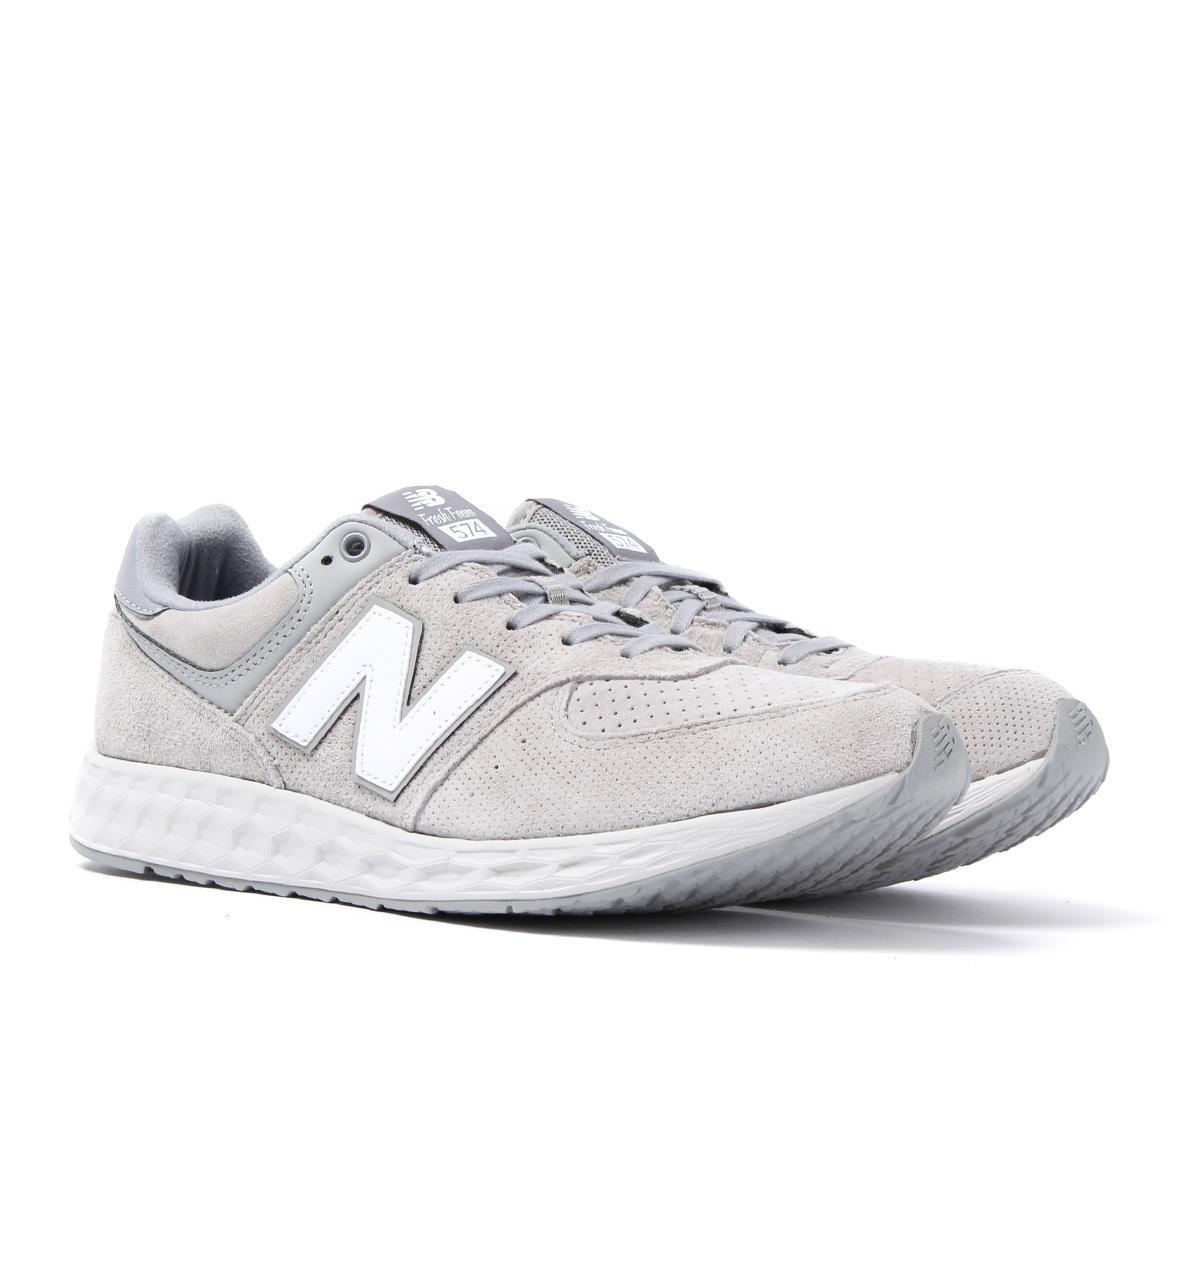 Lyst - New Balance 574 Light Grey Fresh Foam Trainers in Gray for Men c9c047915ef79